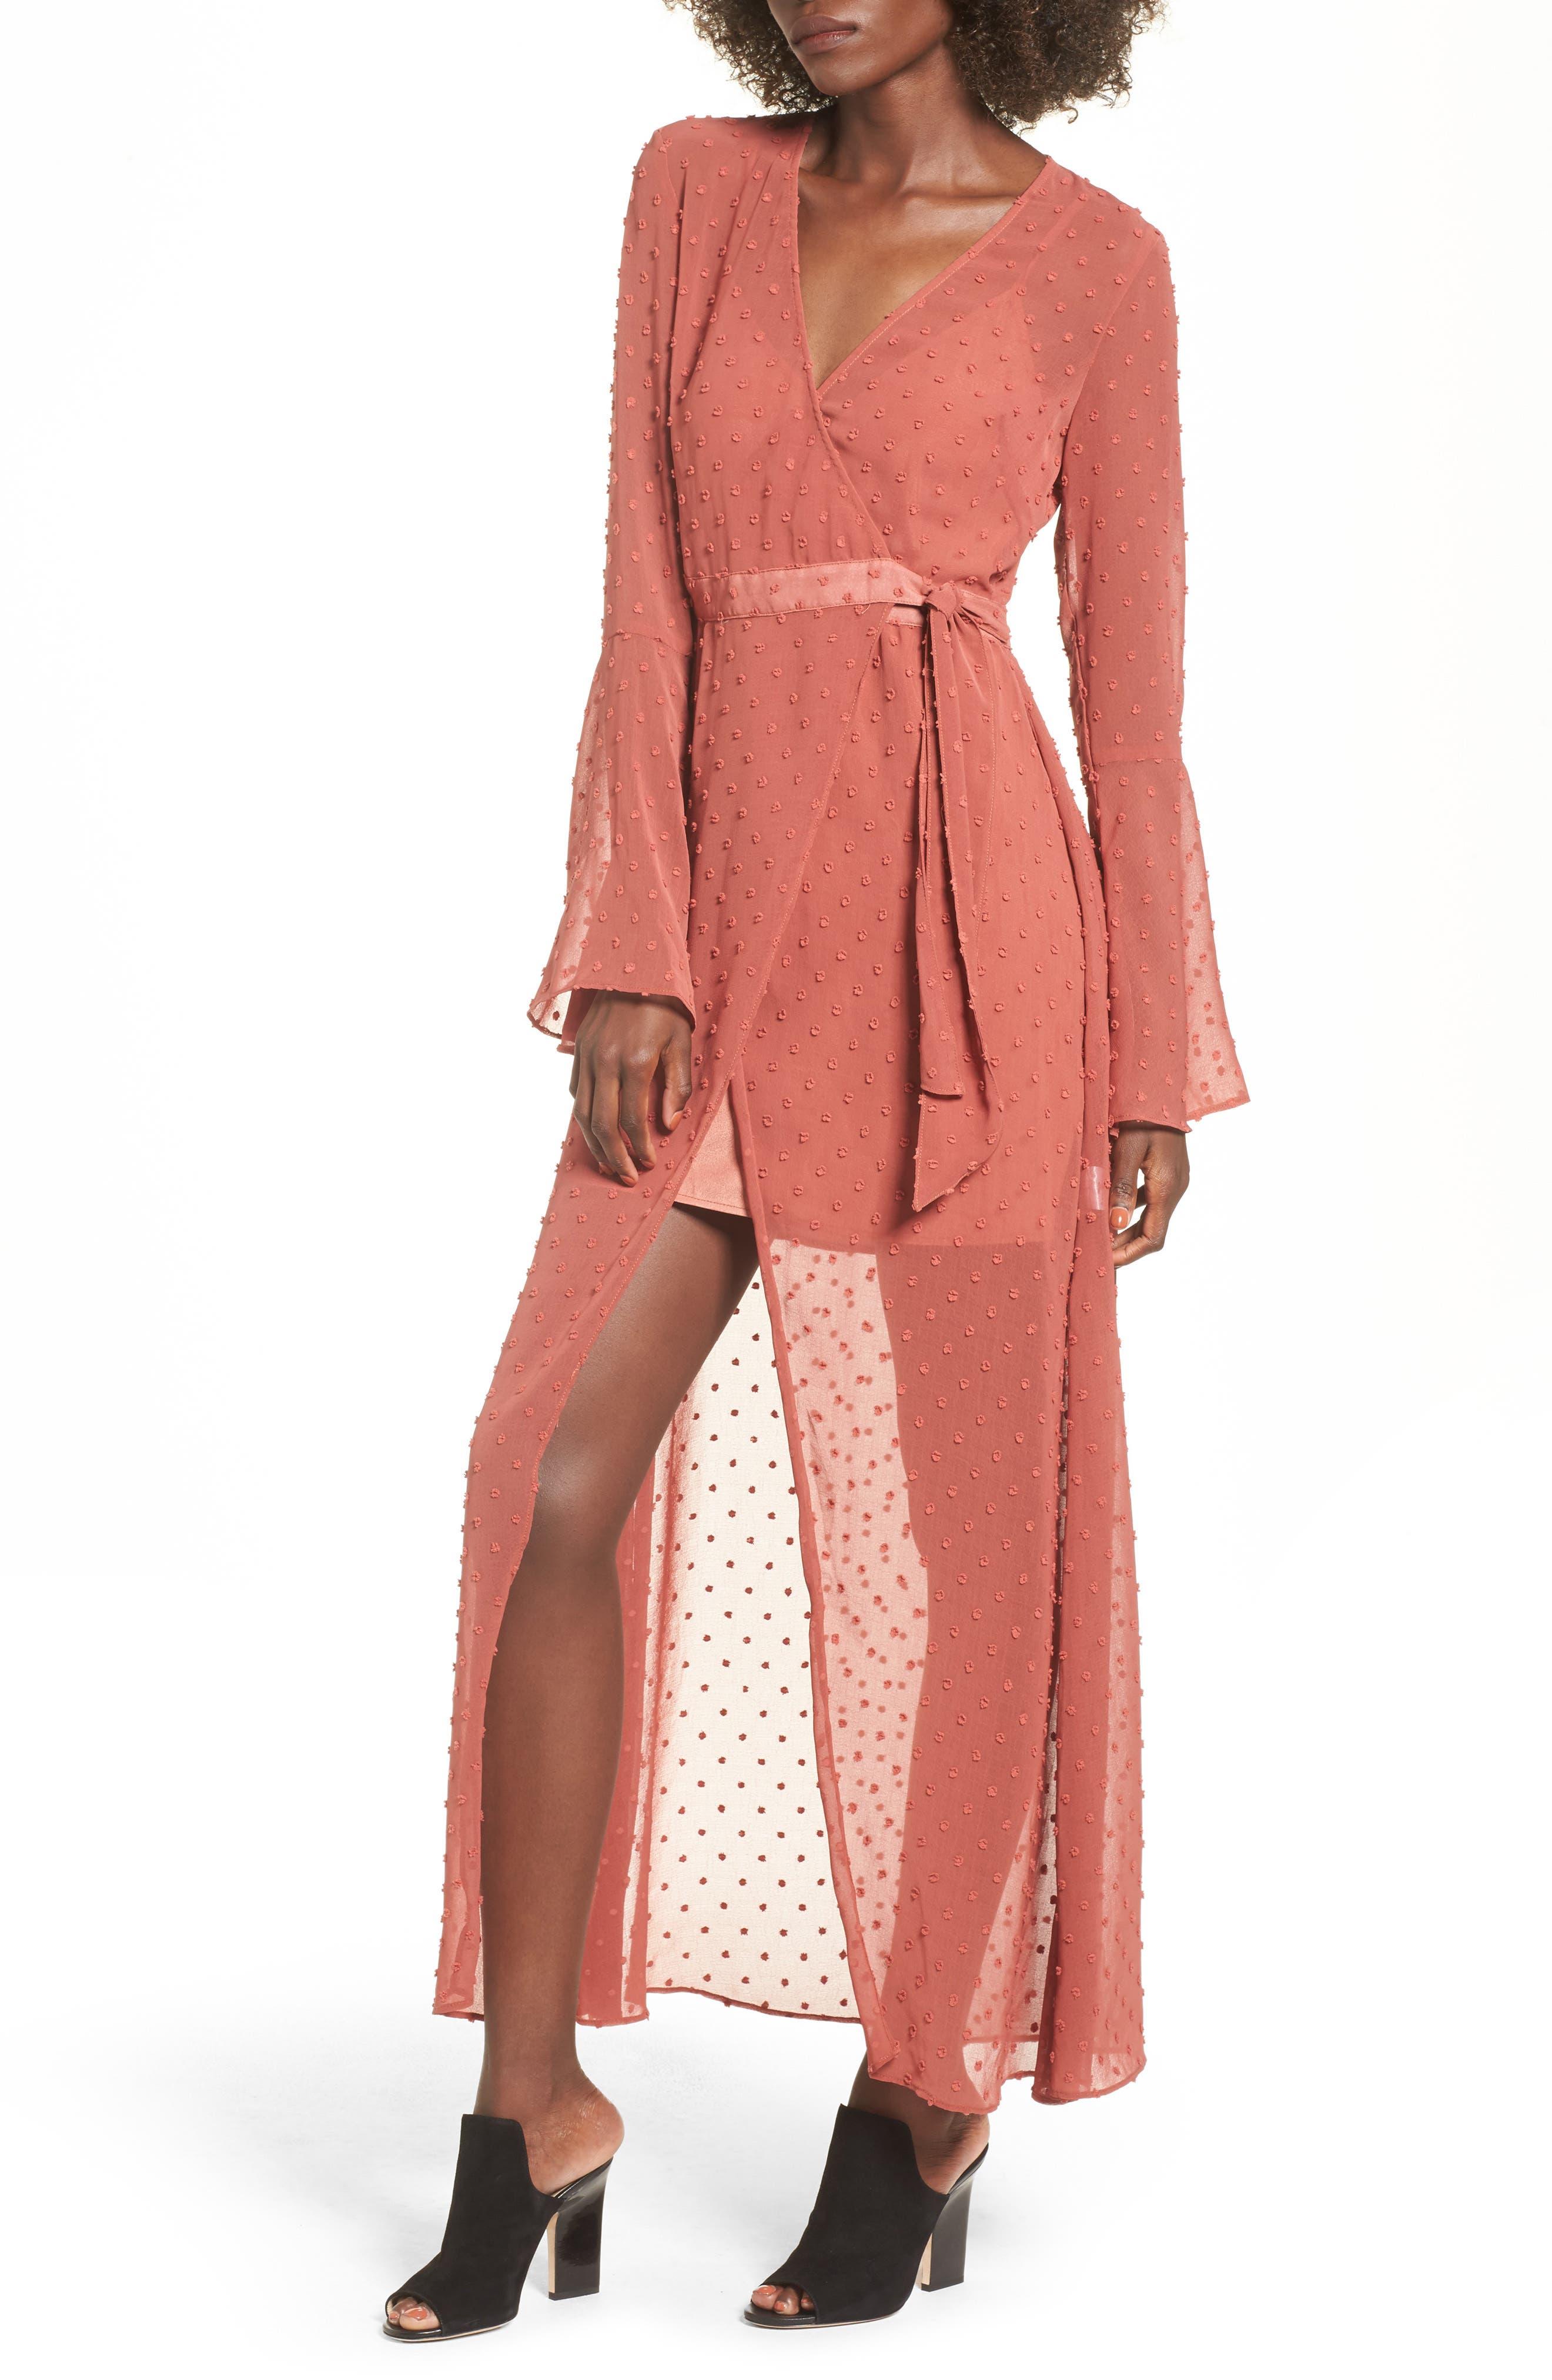 Freya Bell Sleeve Wrap Maxi Dress,                             Main thumbnail 1, color,                             Cinnamon